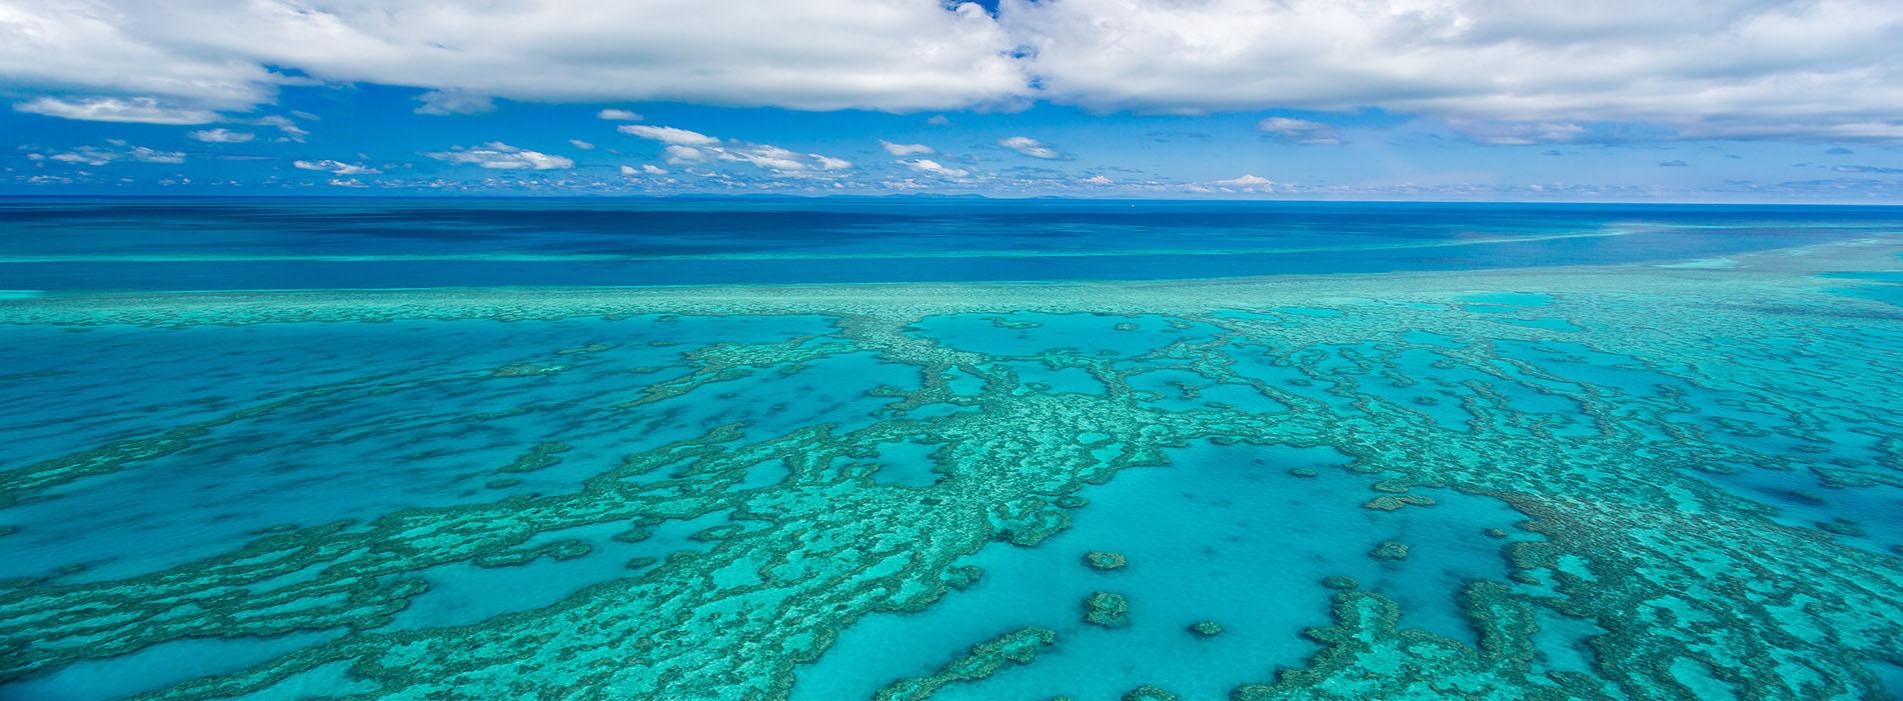 ROWLEY SHOALS fishing blue reefs